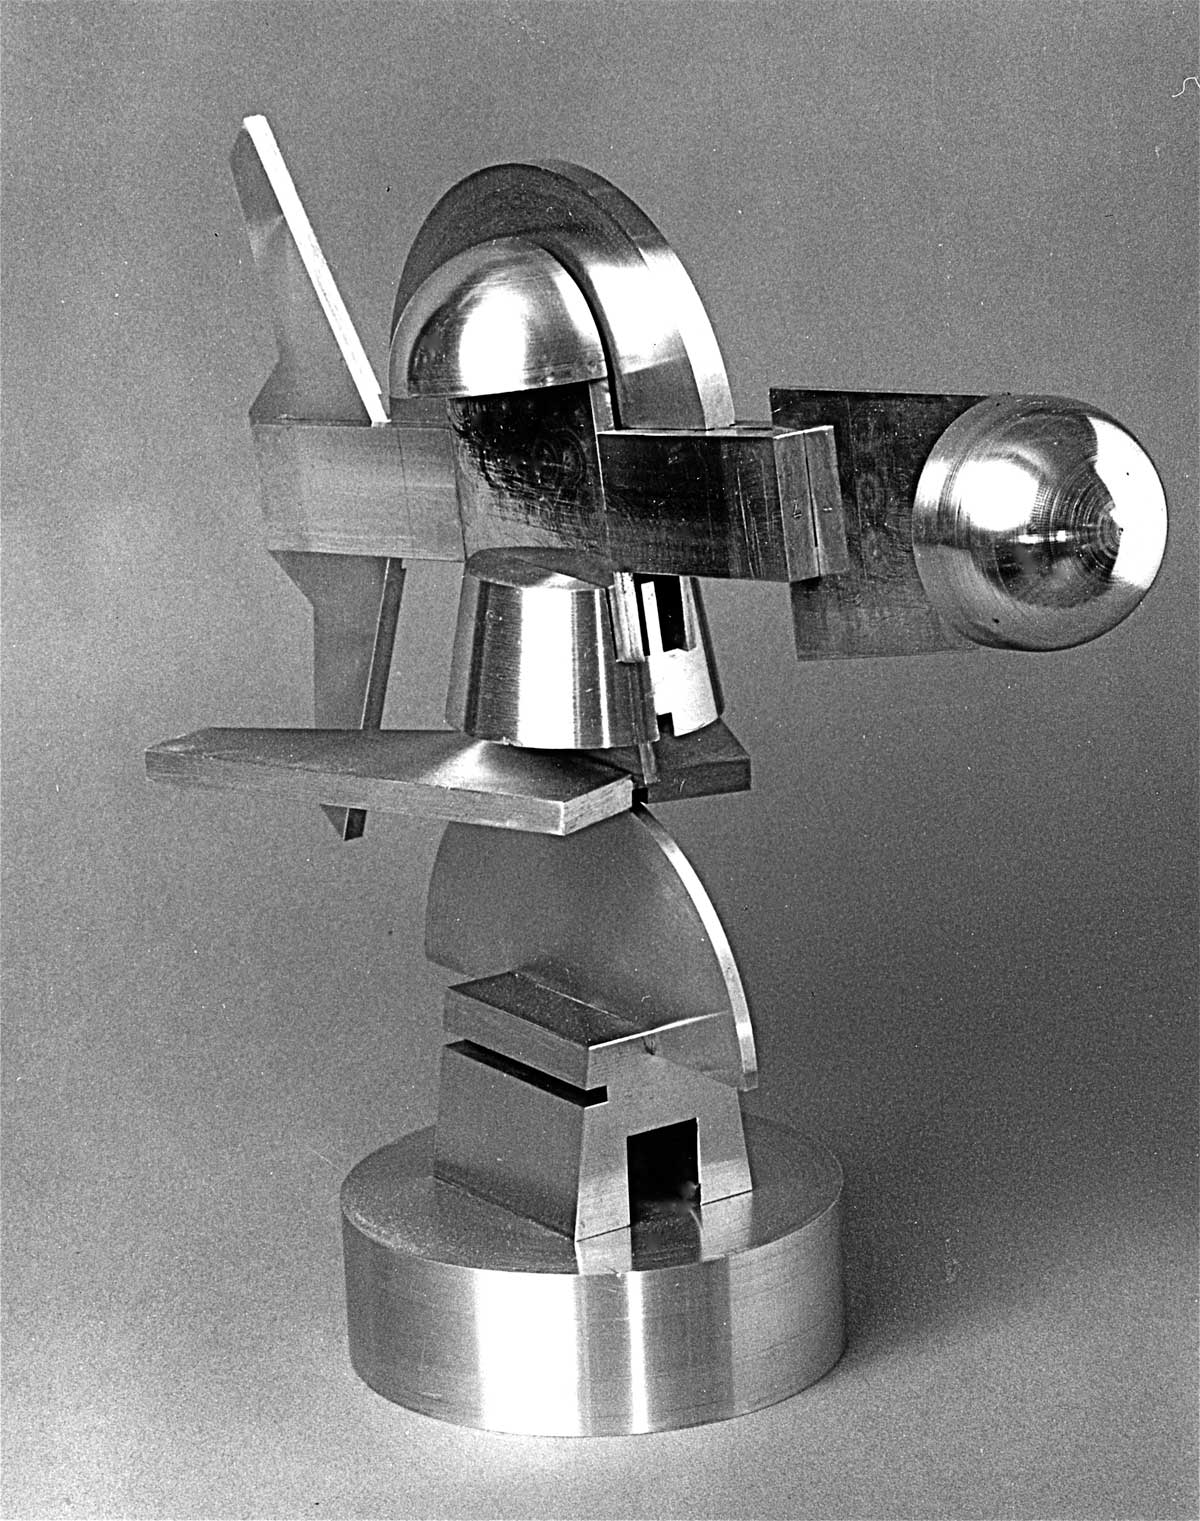 14-ENGIN-PRET-01